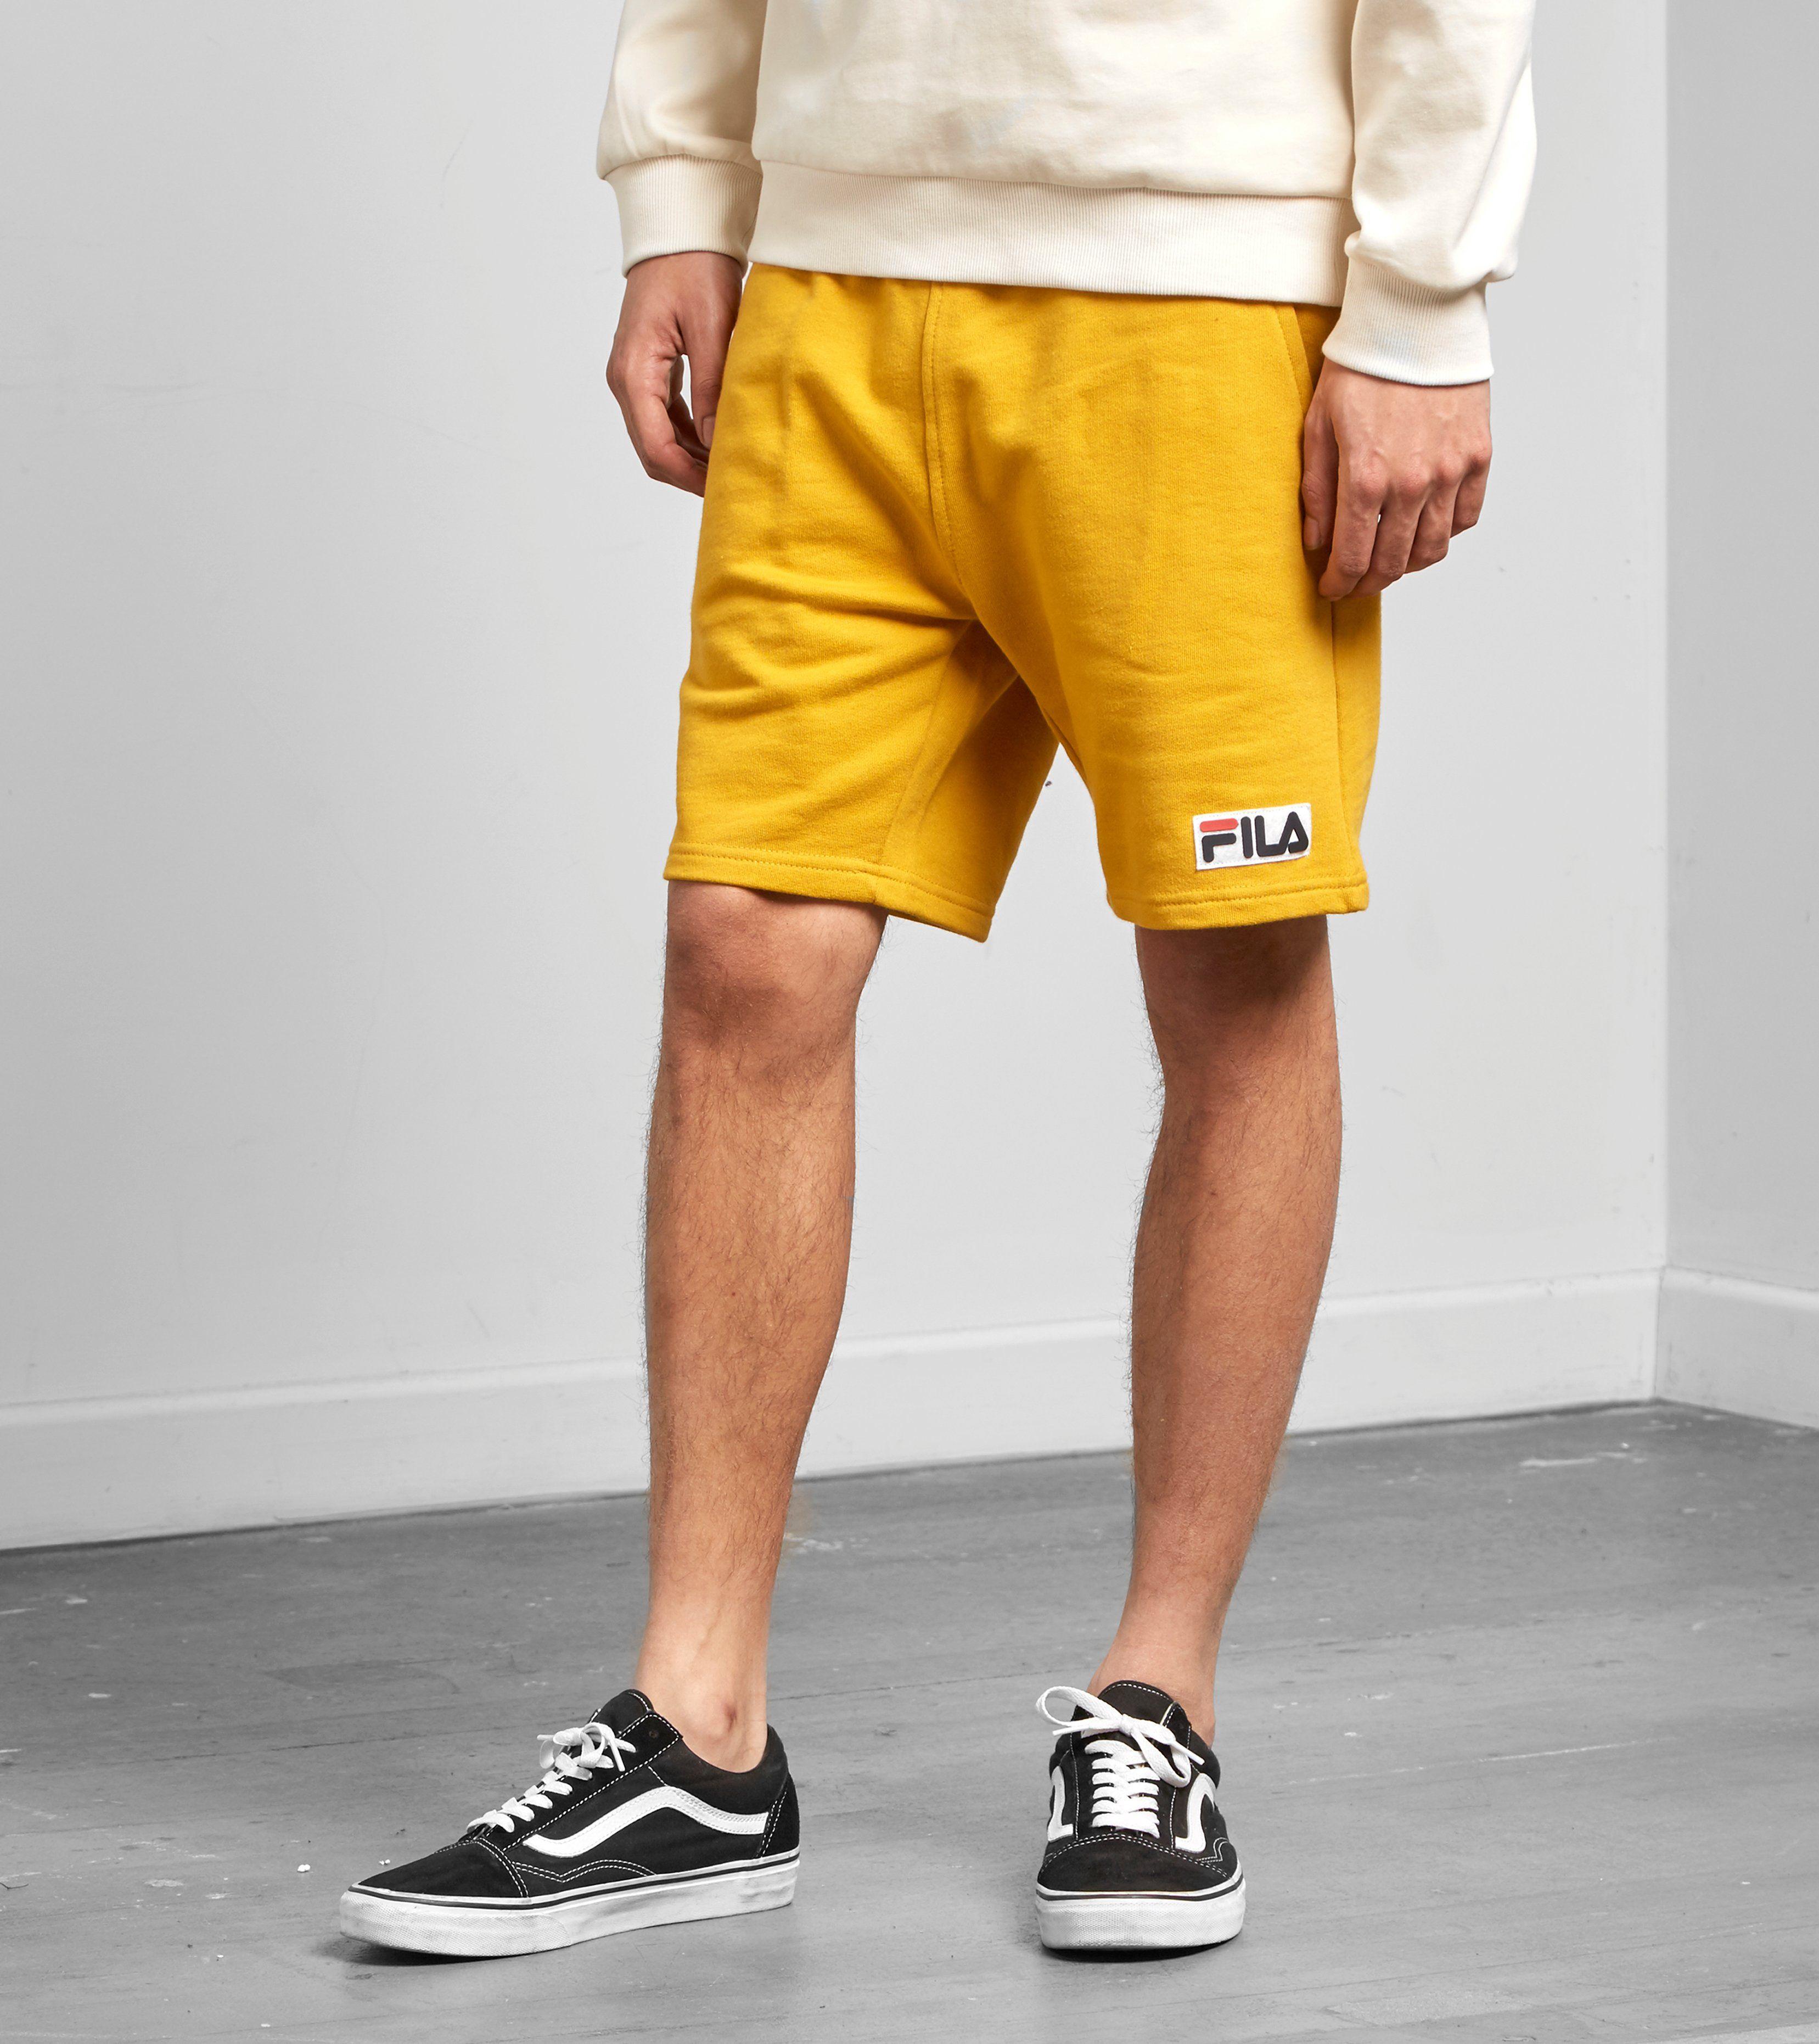 Fila Island Shorts - size? Exclusive